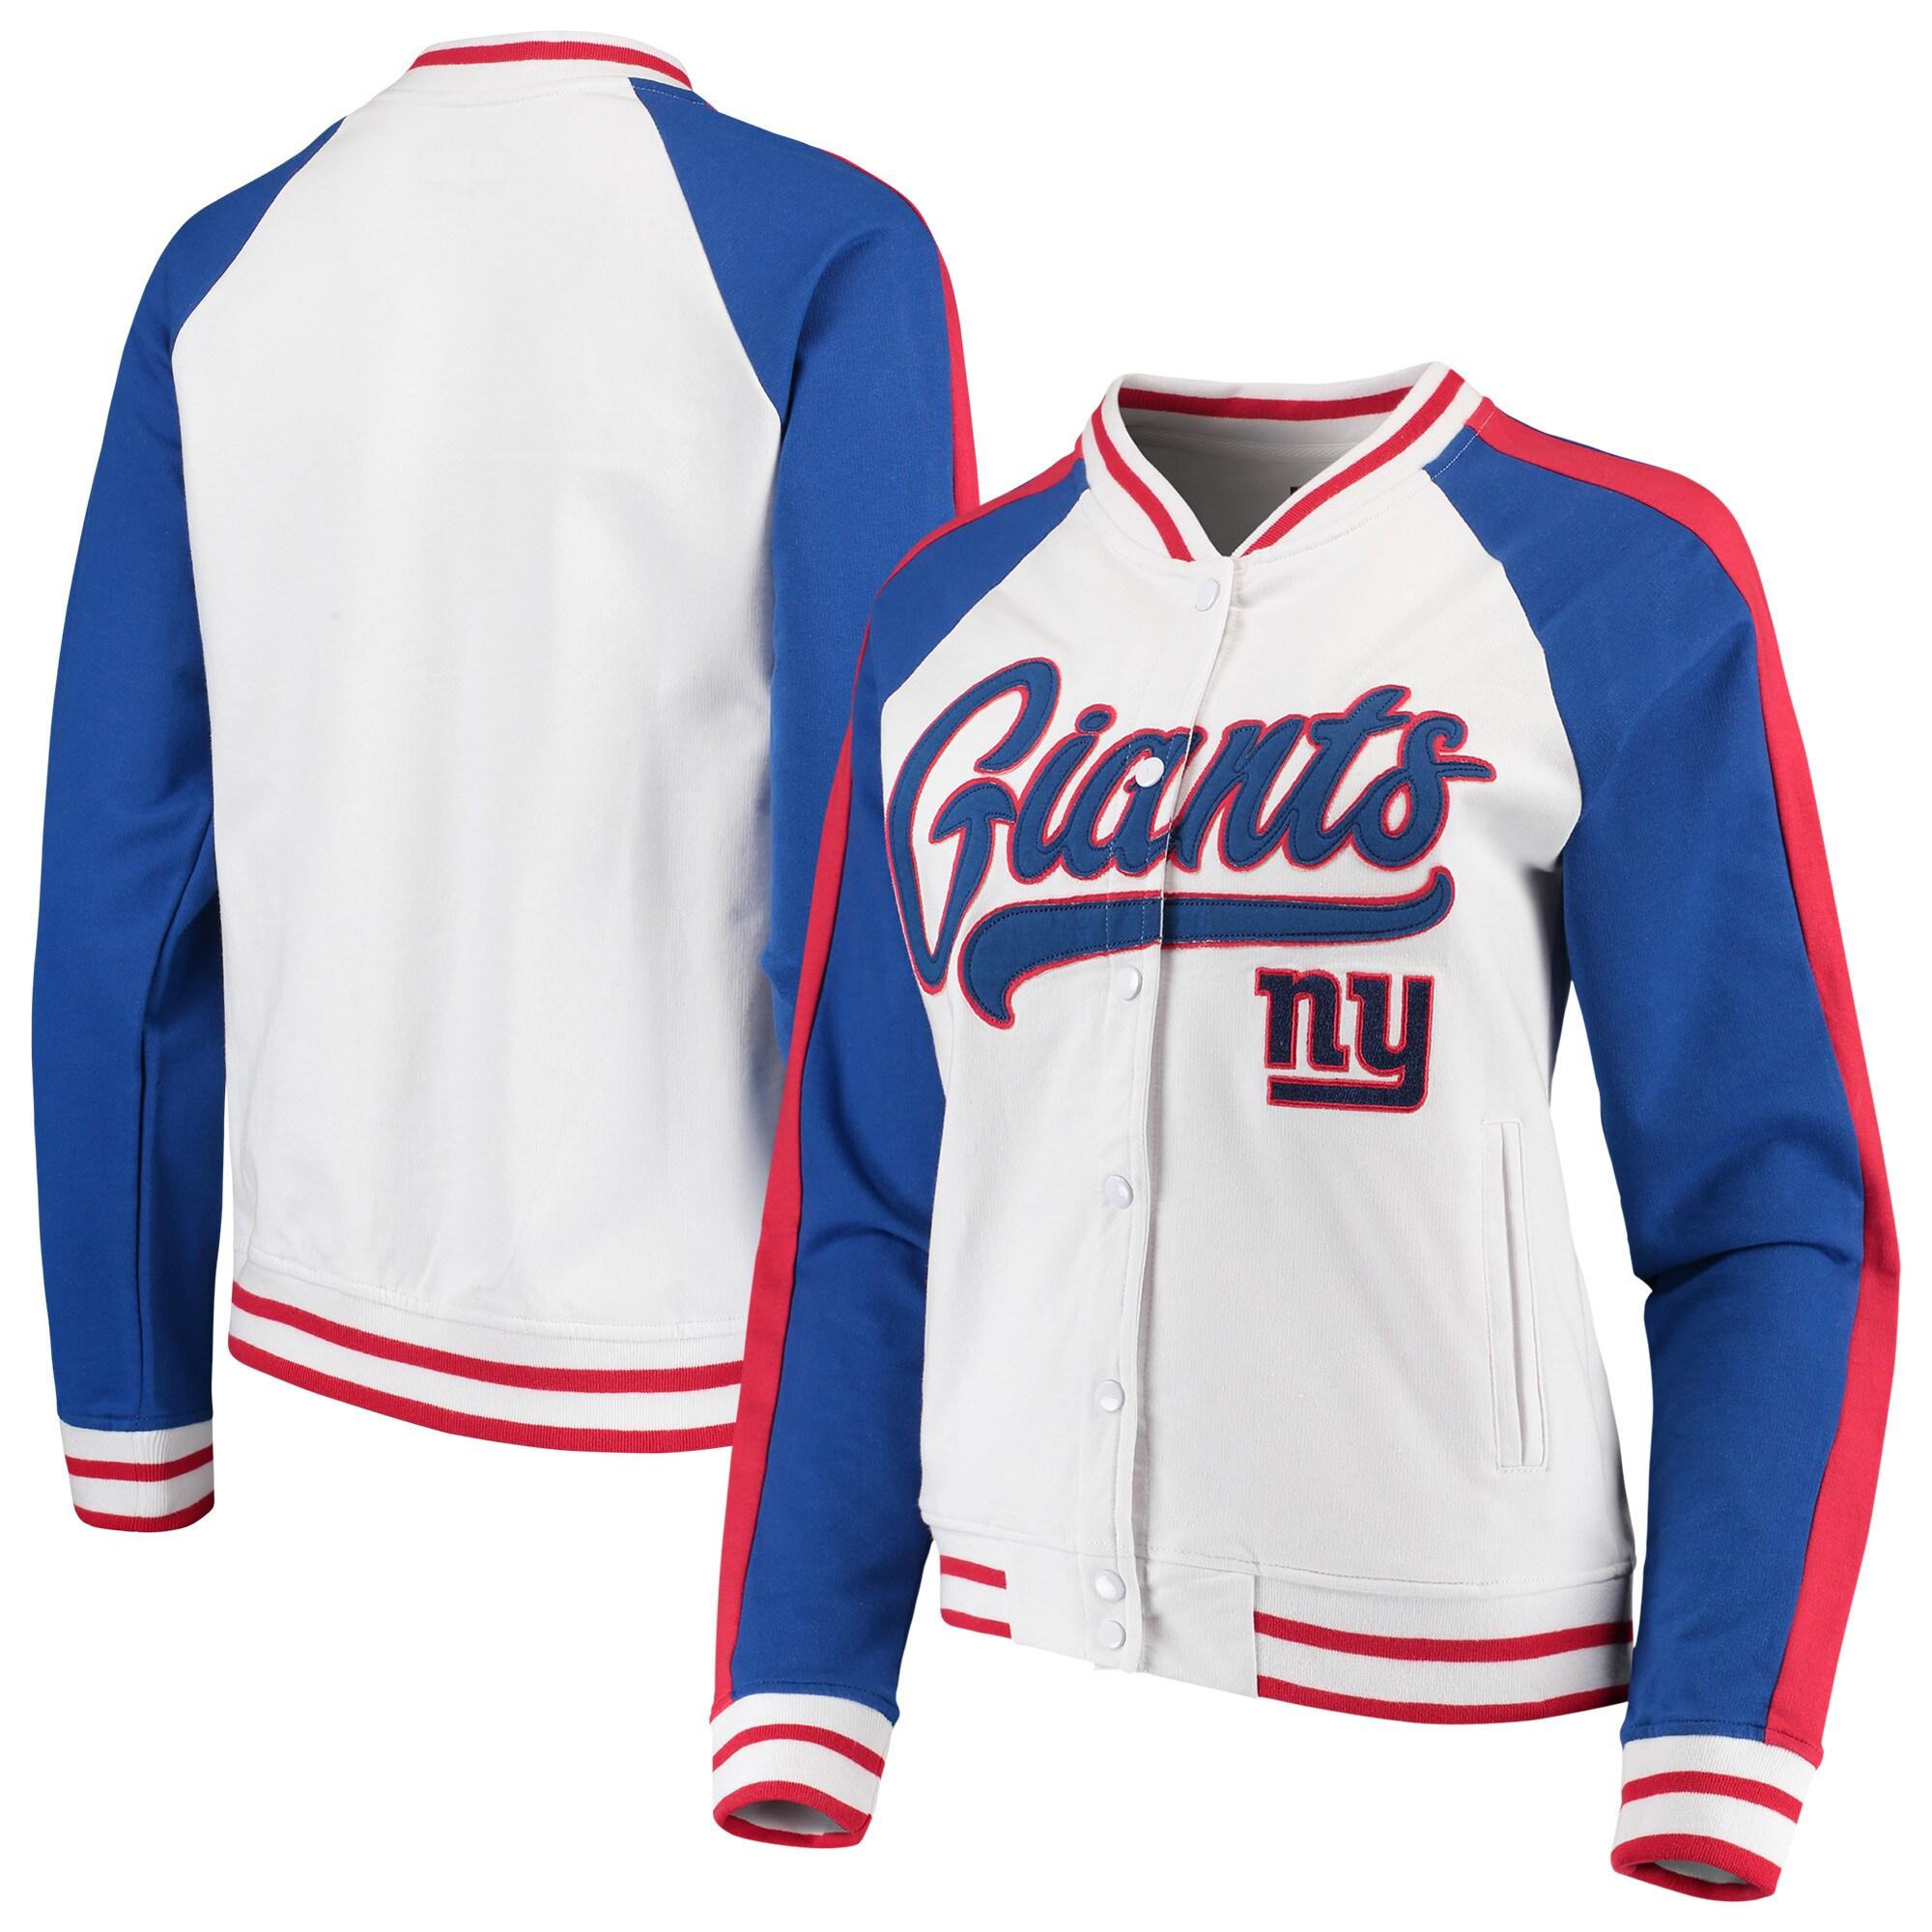 New York Giants New Era Women's Varsity Full Snap Jacket - White/Royal